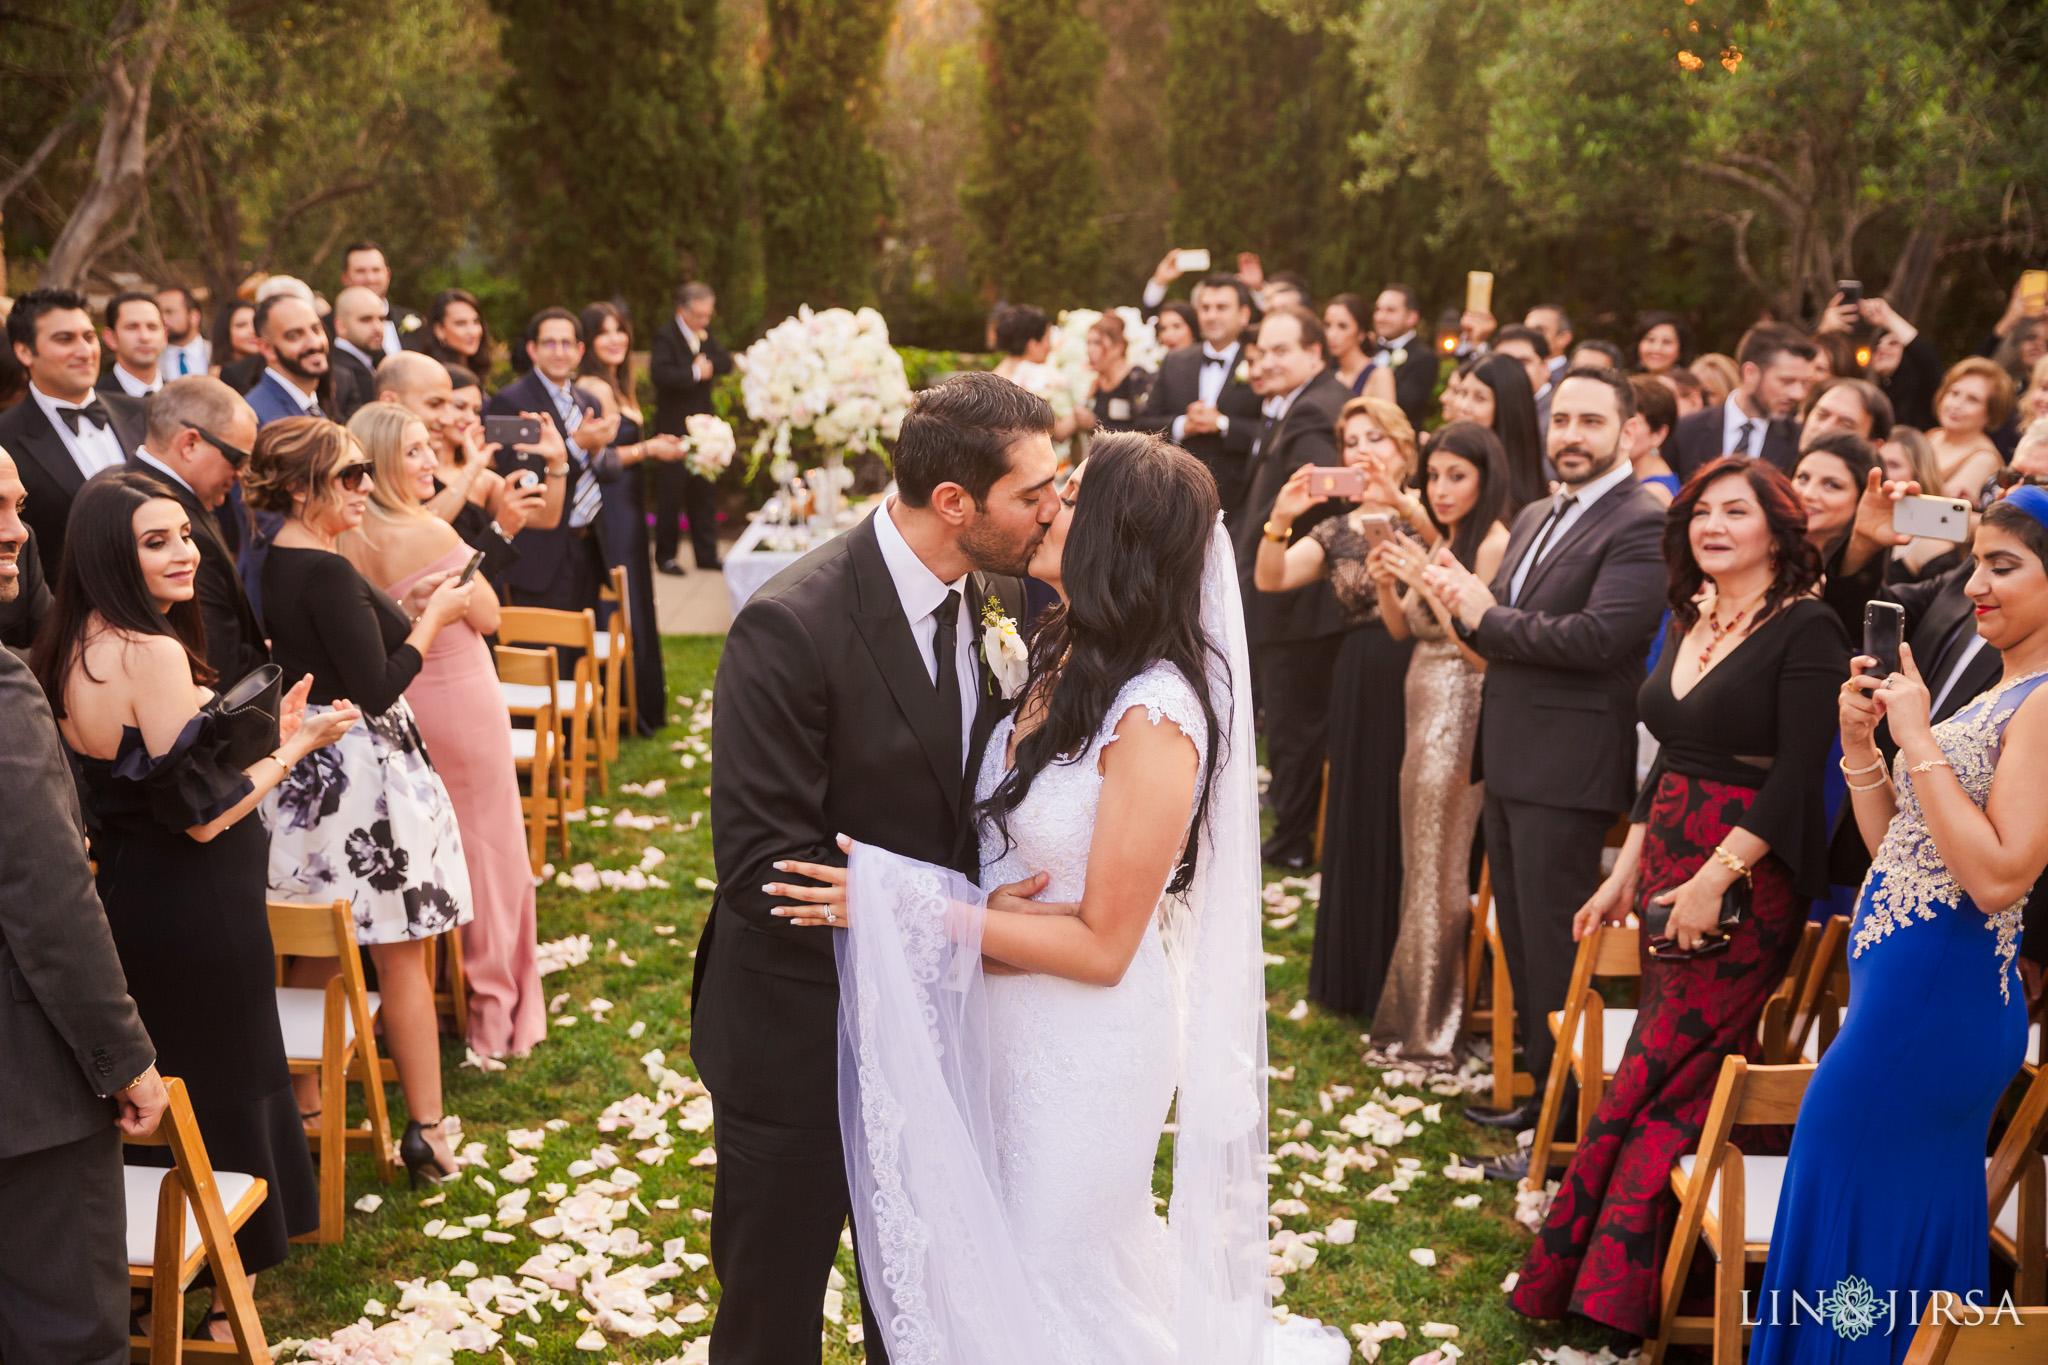 036 estancia la jolla hotel spa persian sofreh wedding ceremony photography